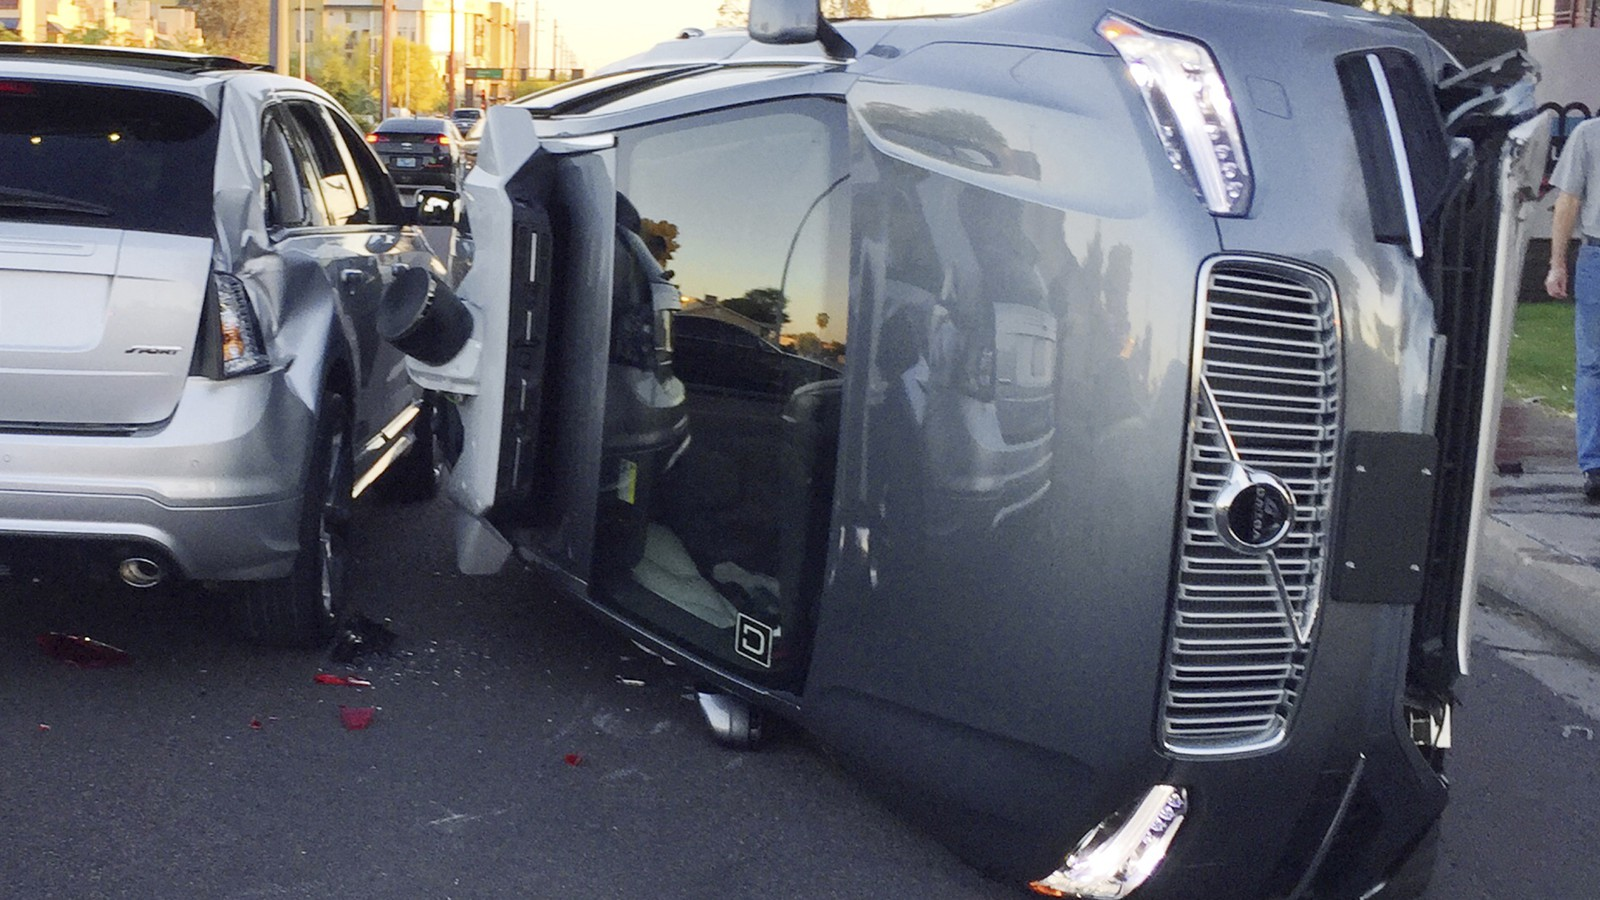 Driver Finally Held Accountable for Fatal Uber Crash